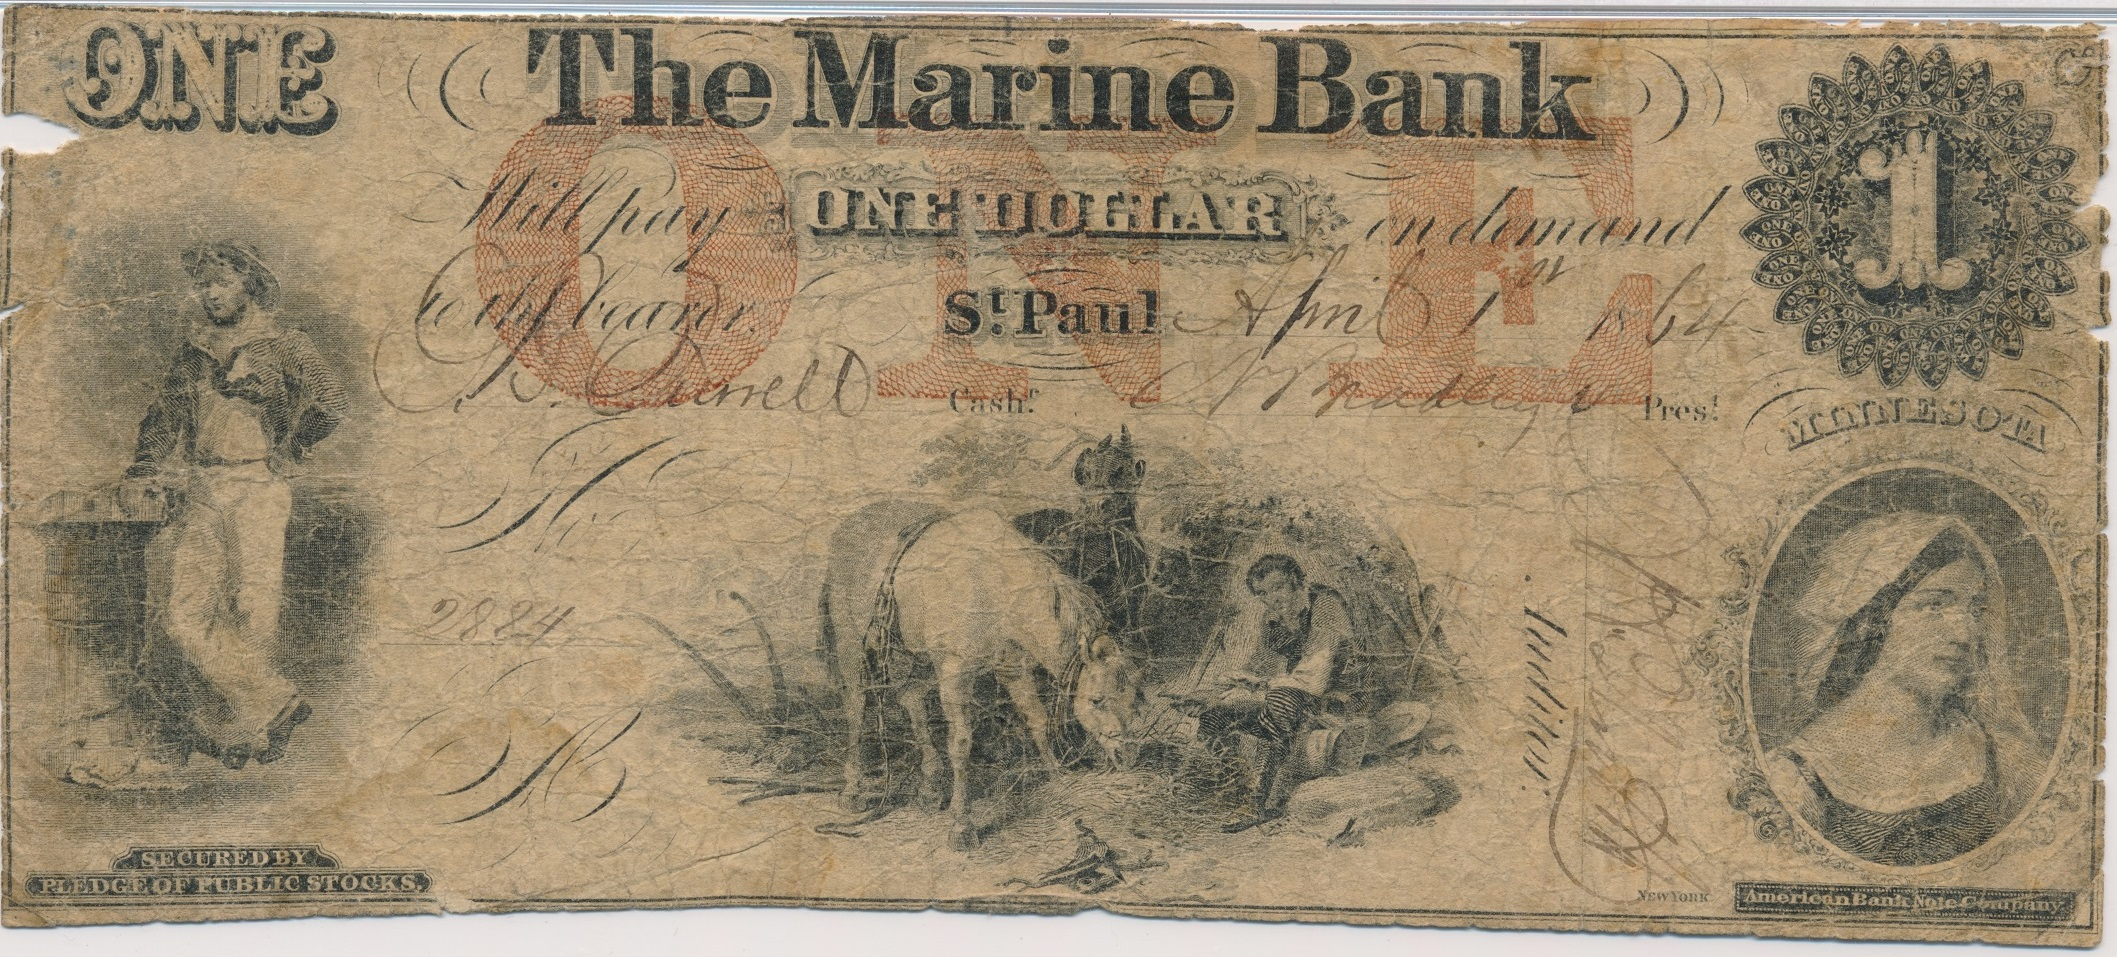 $1 Marine Bank